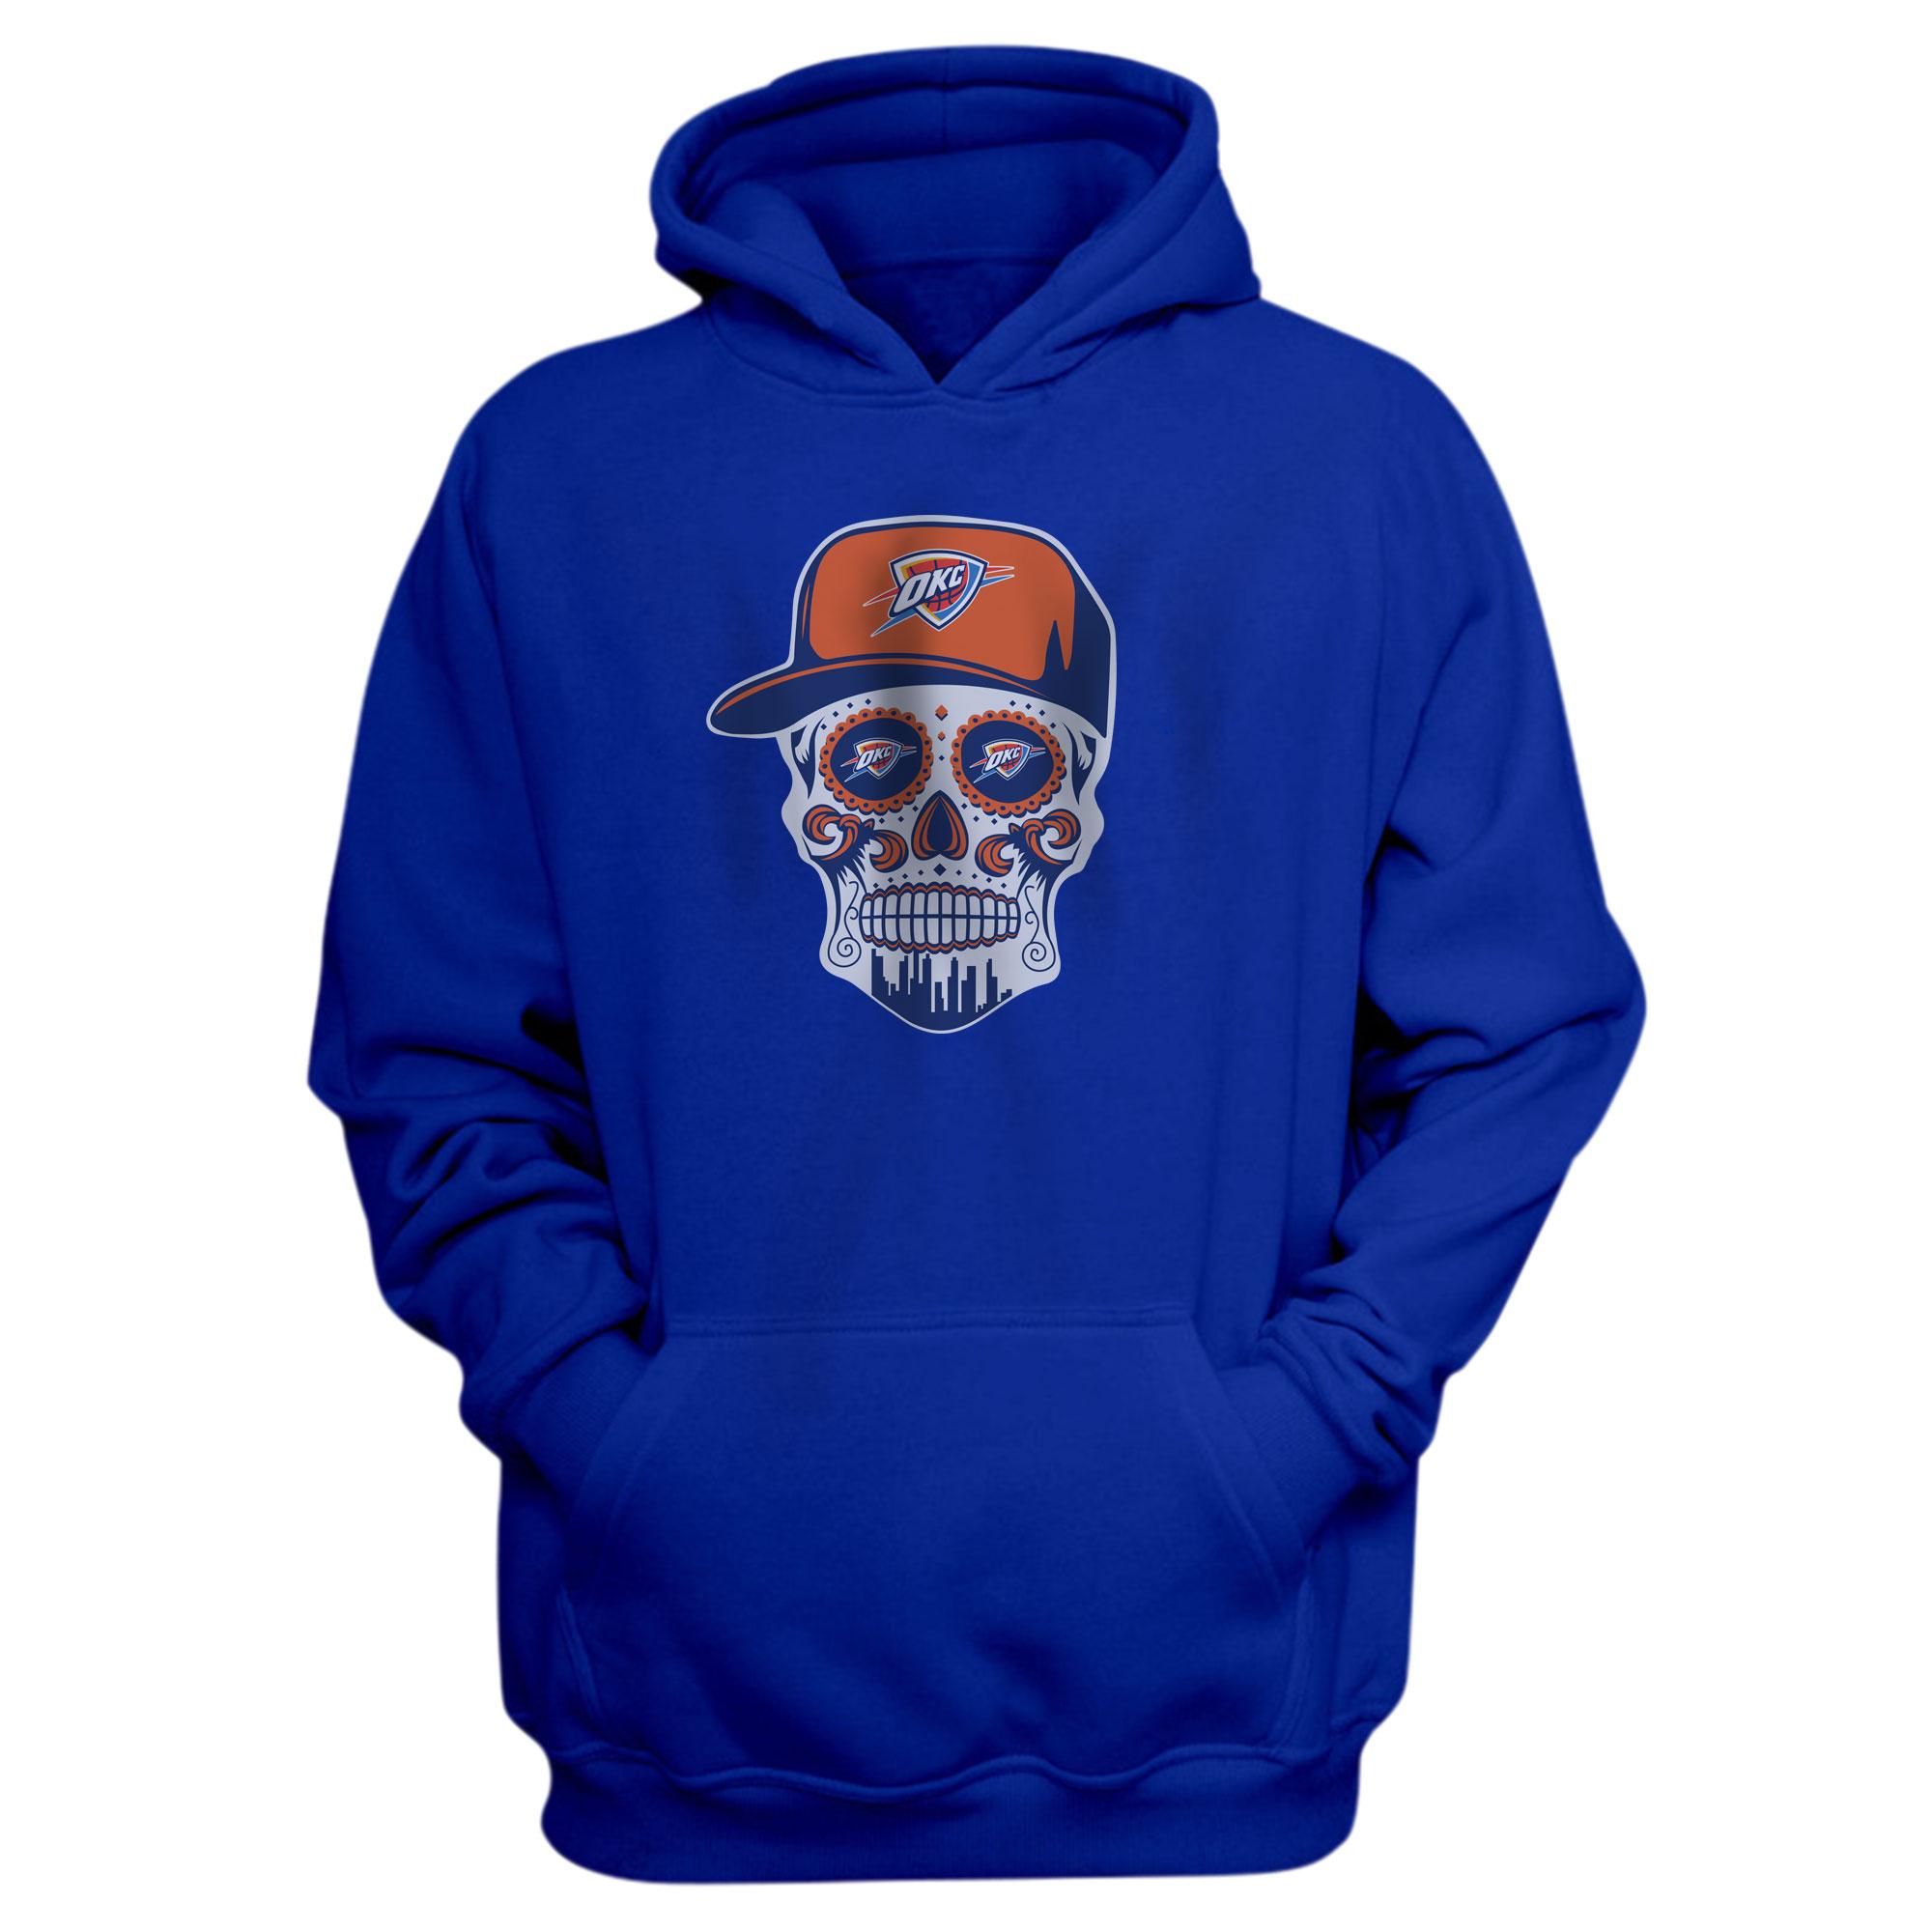 Thunder Skull  Hoodie  (HD-BLU-NP-459-NBA-OKC-SKULL)